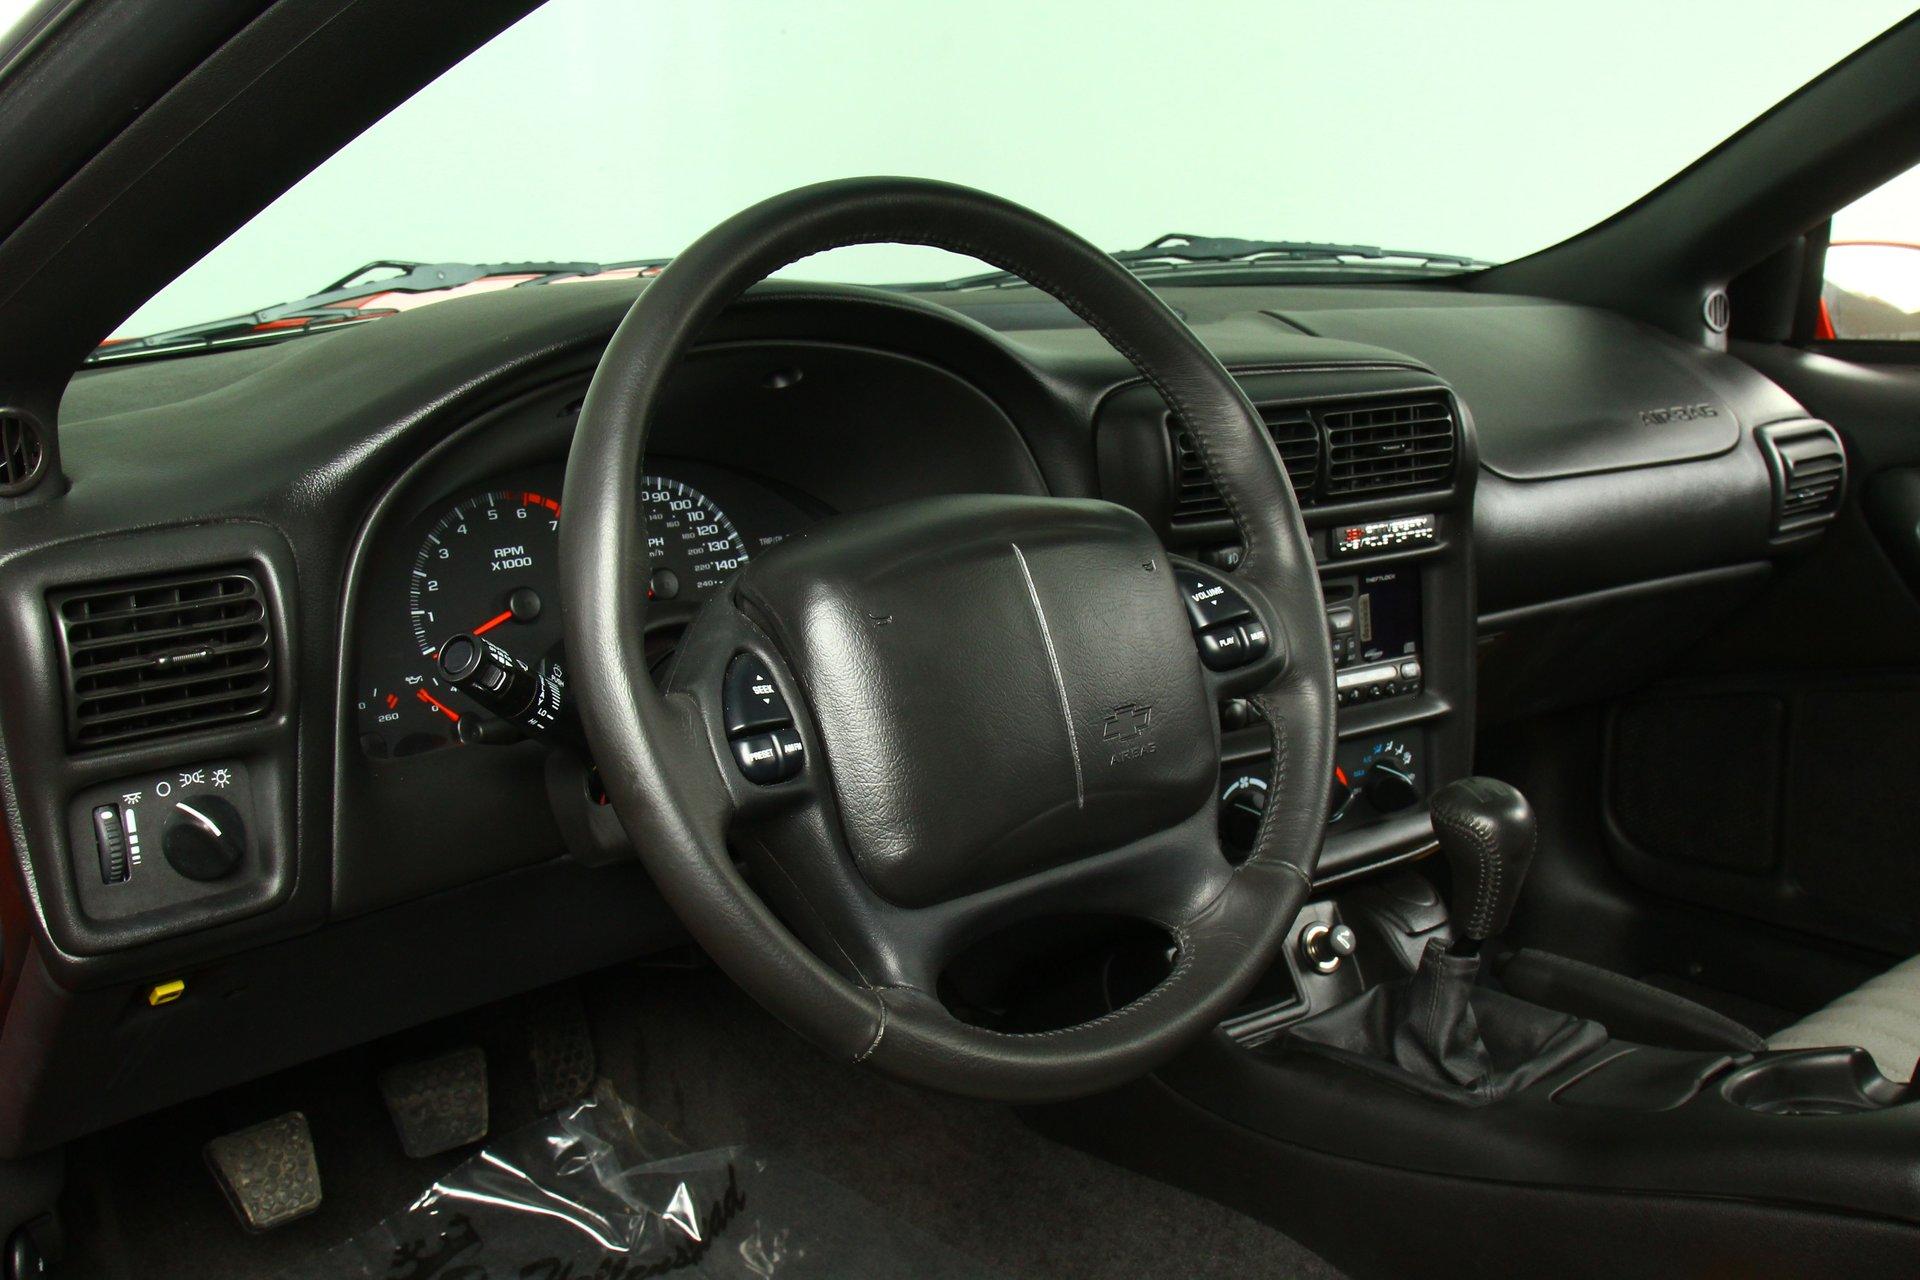 2002 Chevrolet Camaro SS